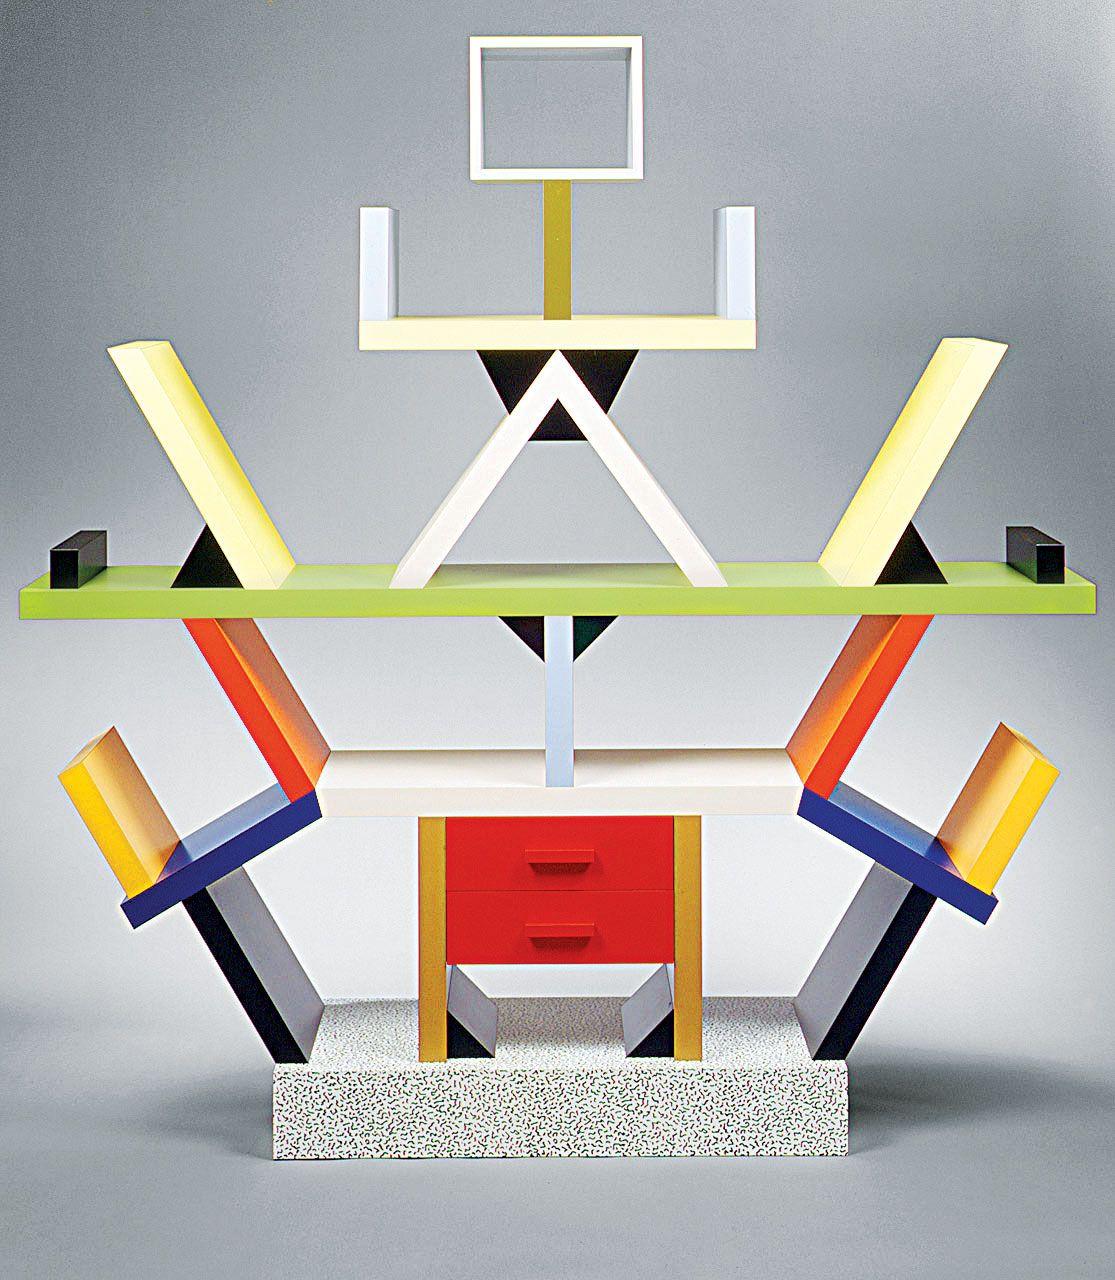 memphis design furniture. Memphis Design Furniture D